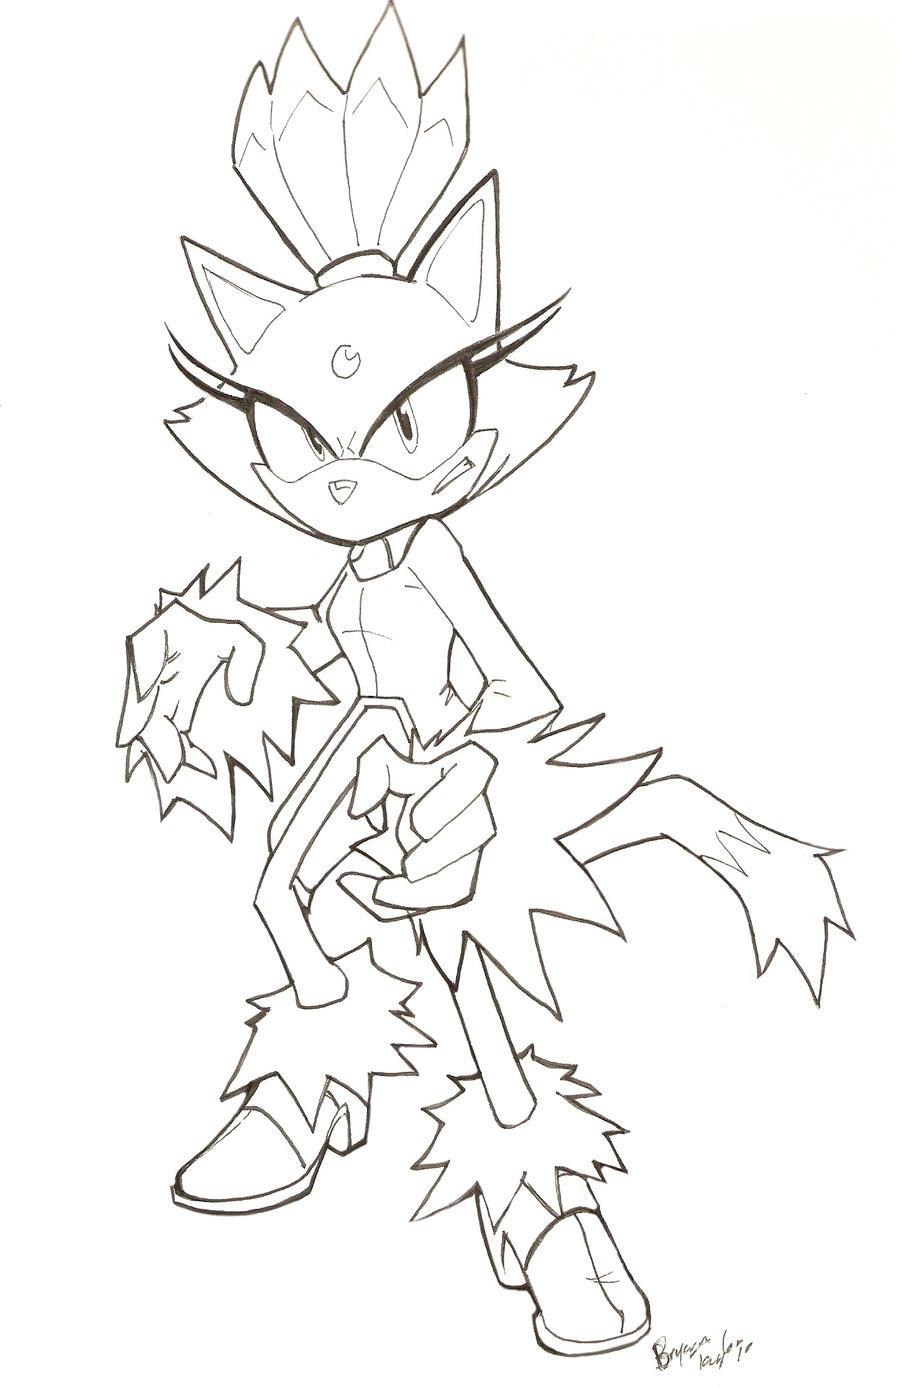 Blaze the cat by vauz on deviantart for Blaze the cat coloring pages